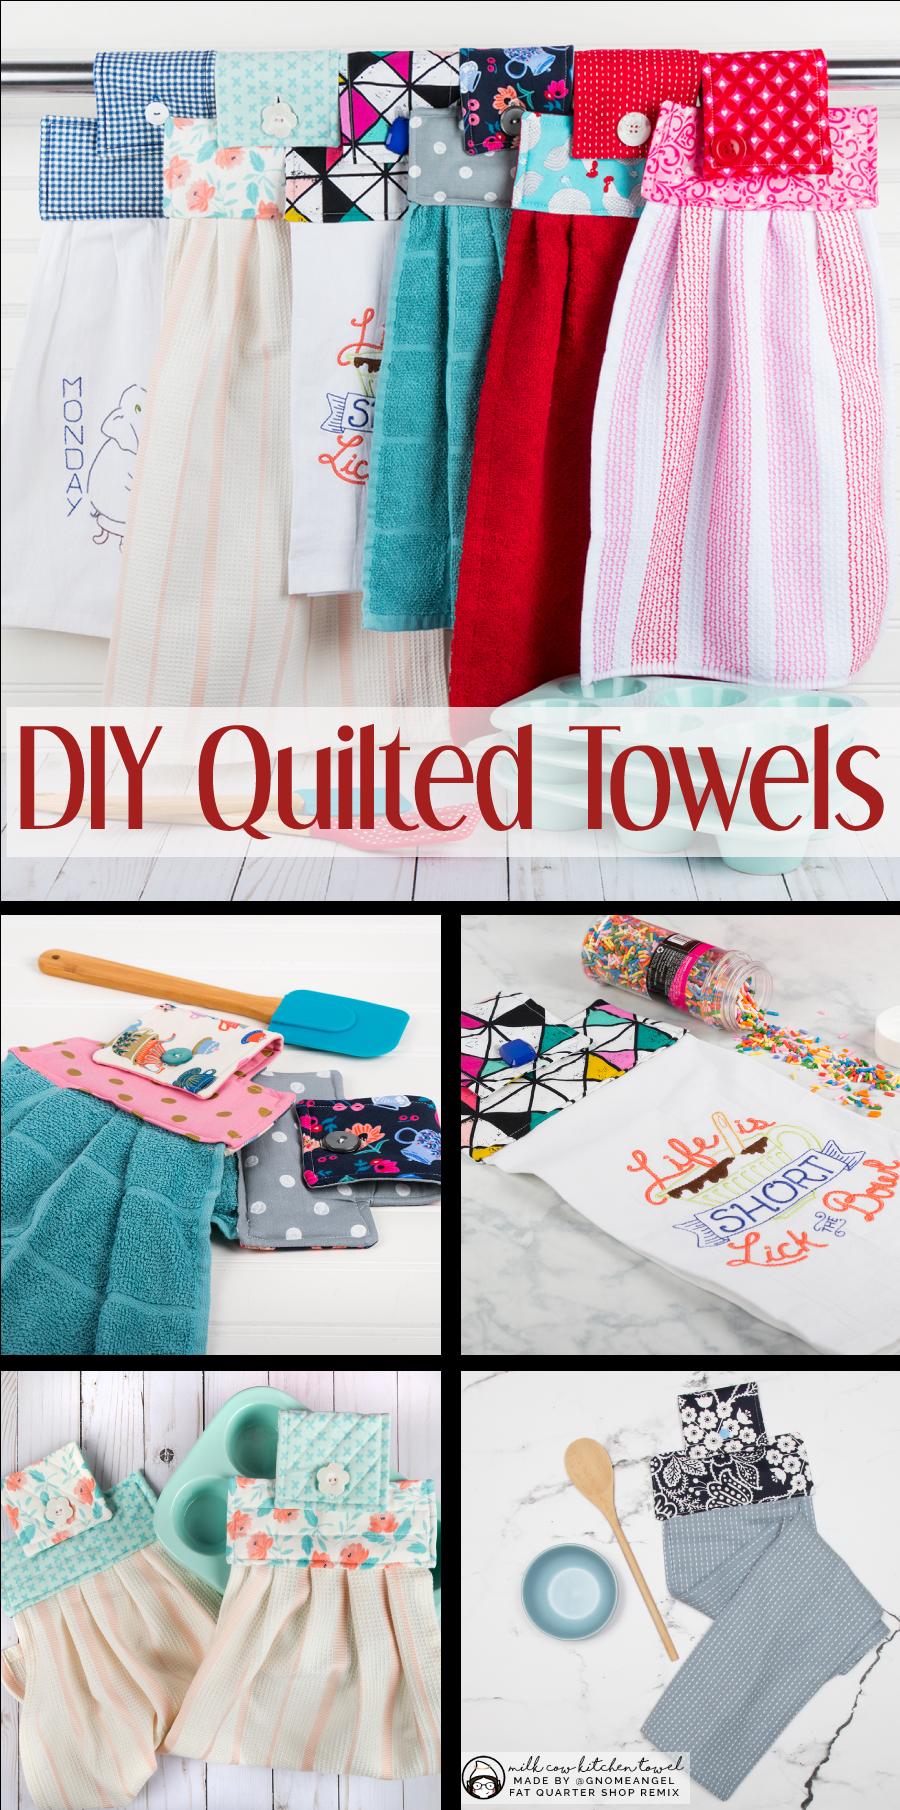 Blog Remix 2 Diy Hanging Kitchen Towel The Jolly Jabber Quilting Blog Kitchen Towels Hanging Kitchen Towels Diy Kids Fabric